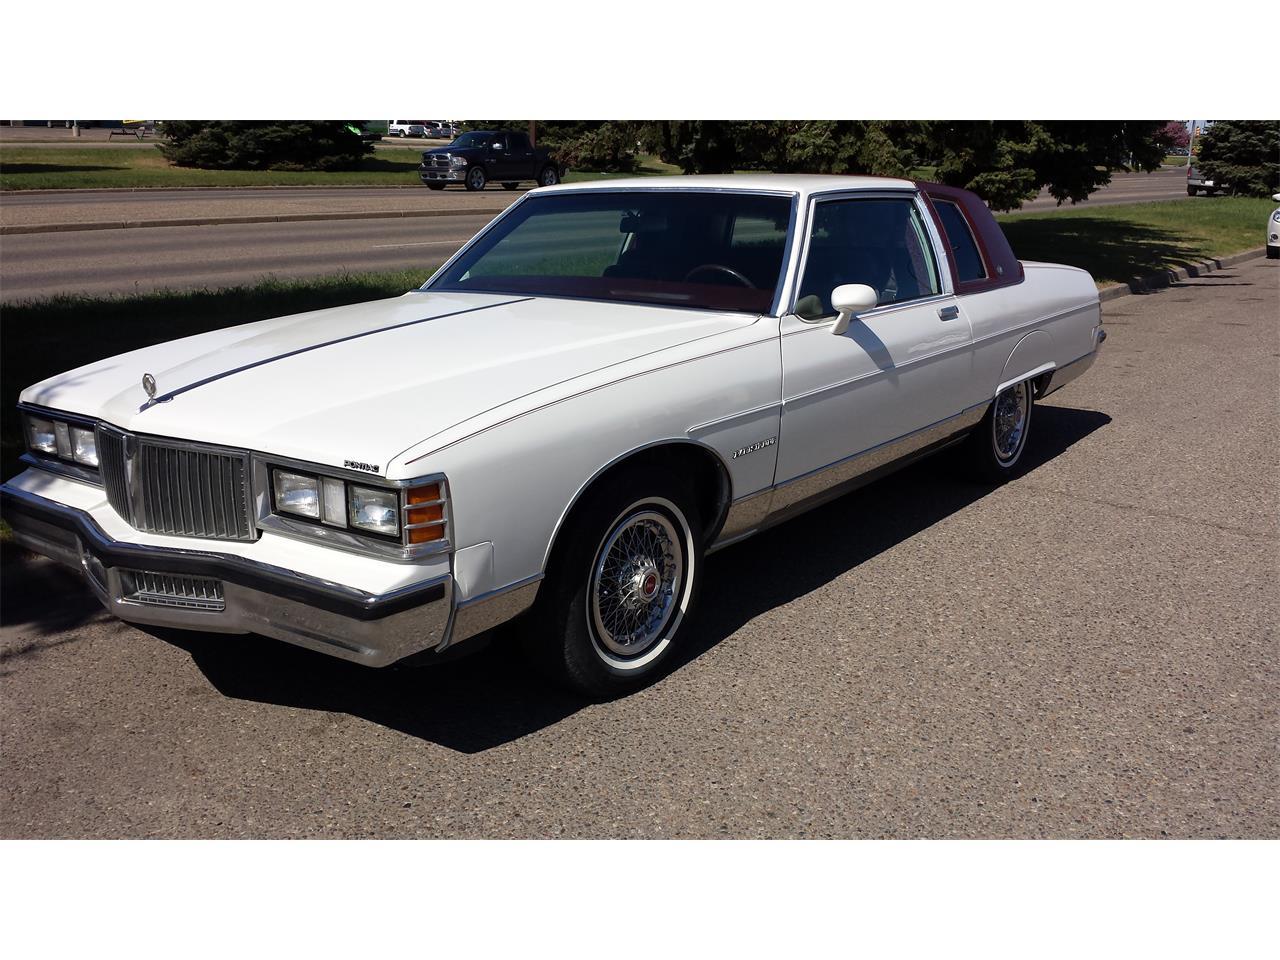 1981 Pontiac Parisienne For Sale Classiccars Com Cc 853354